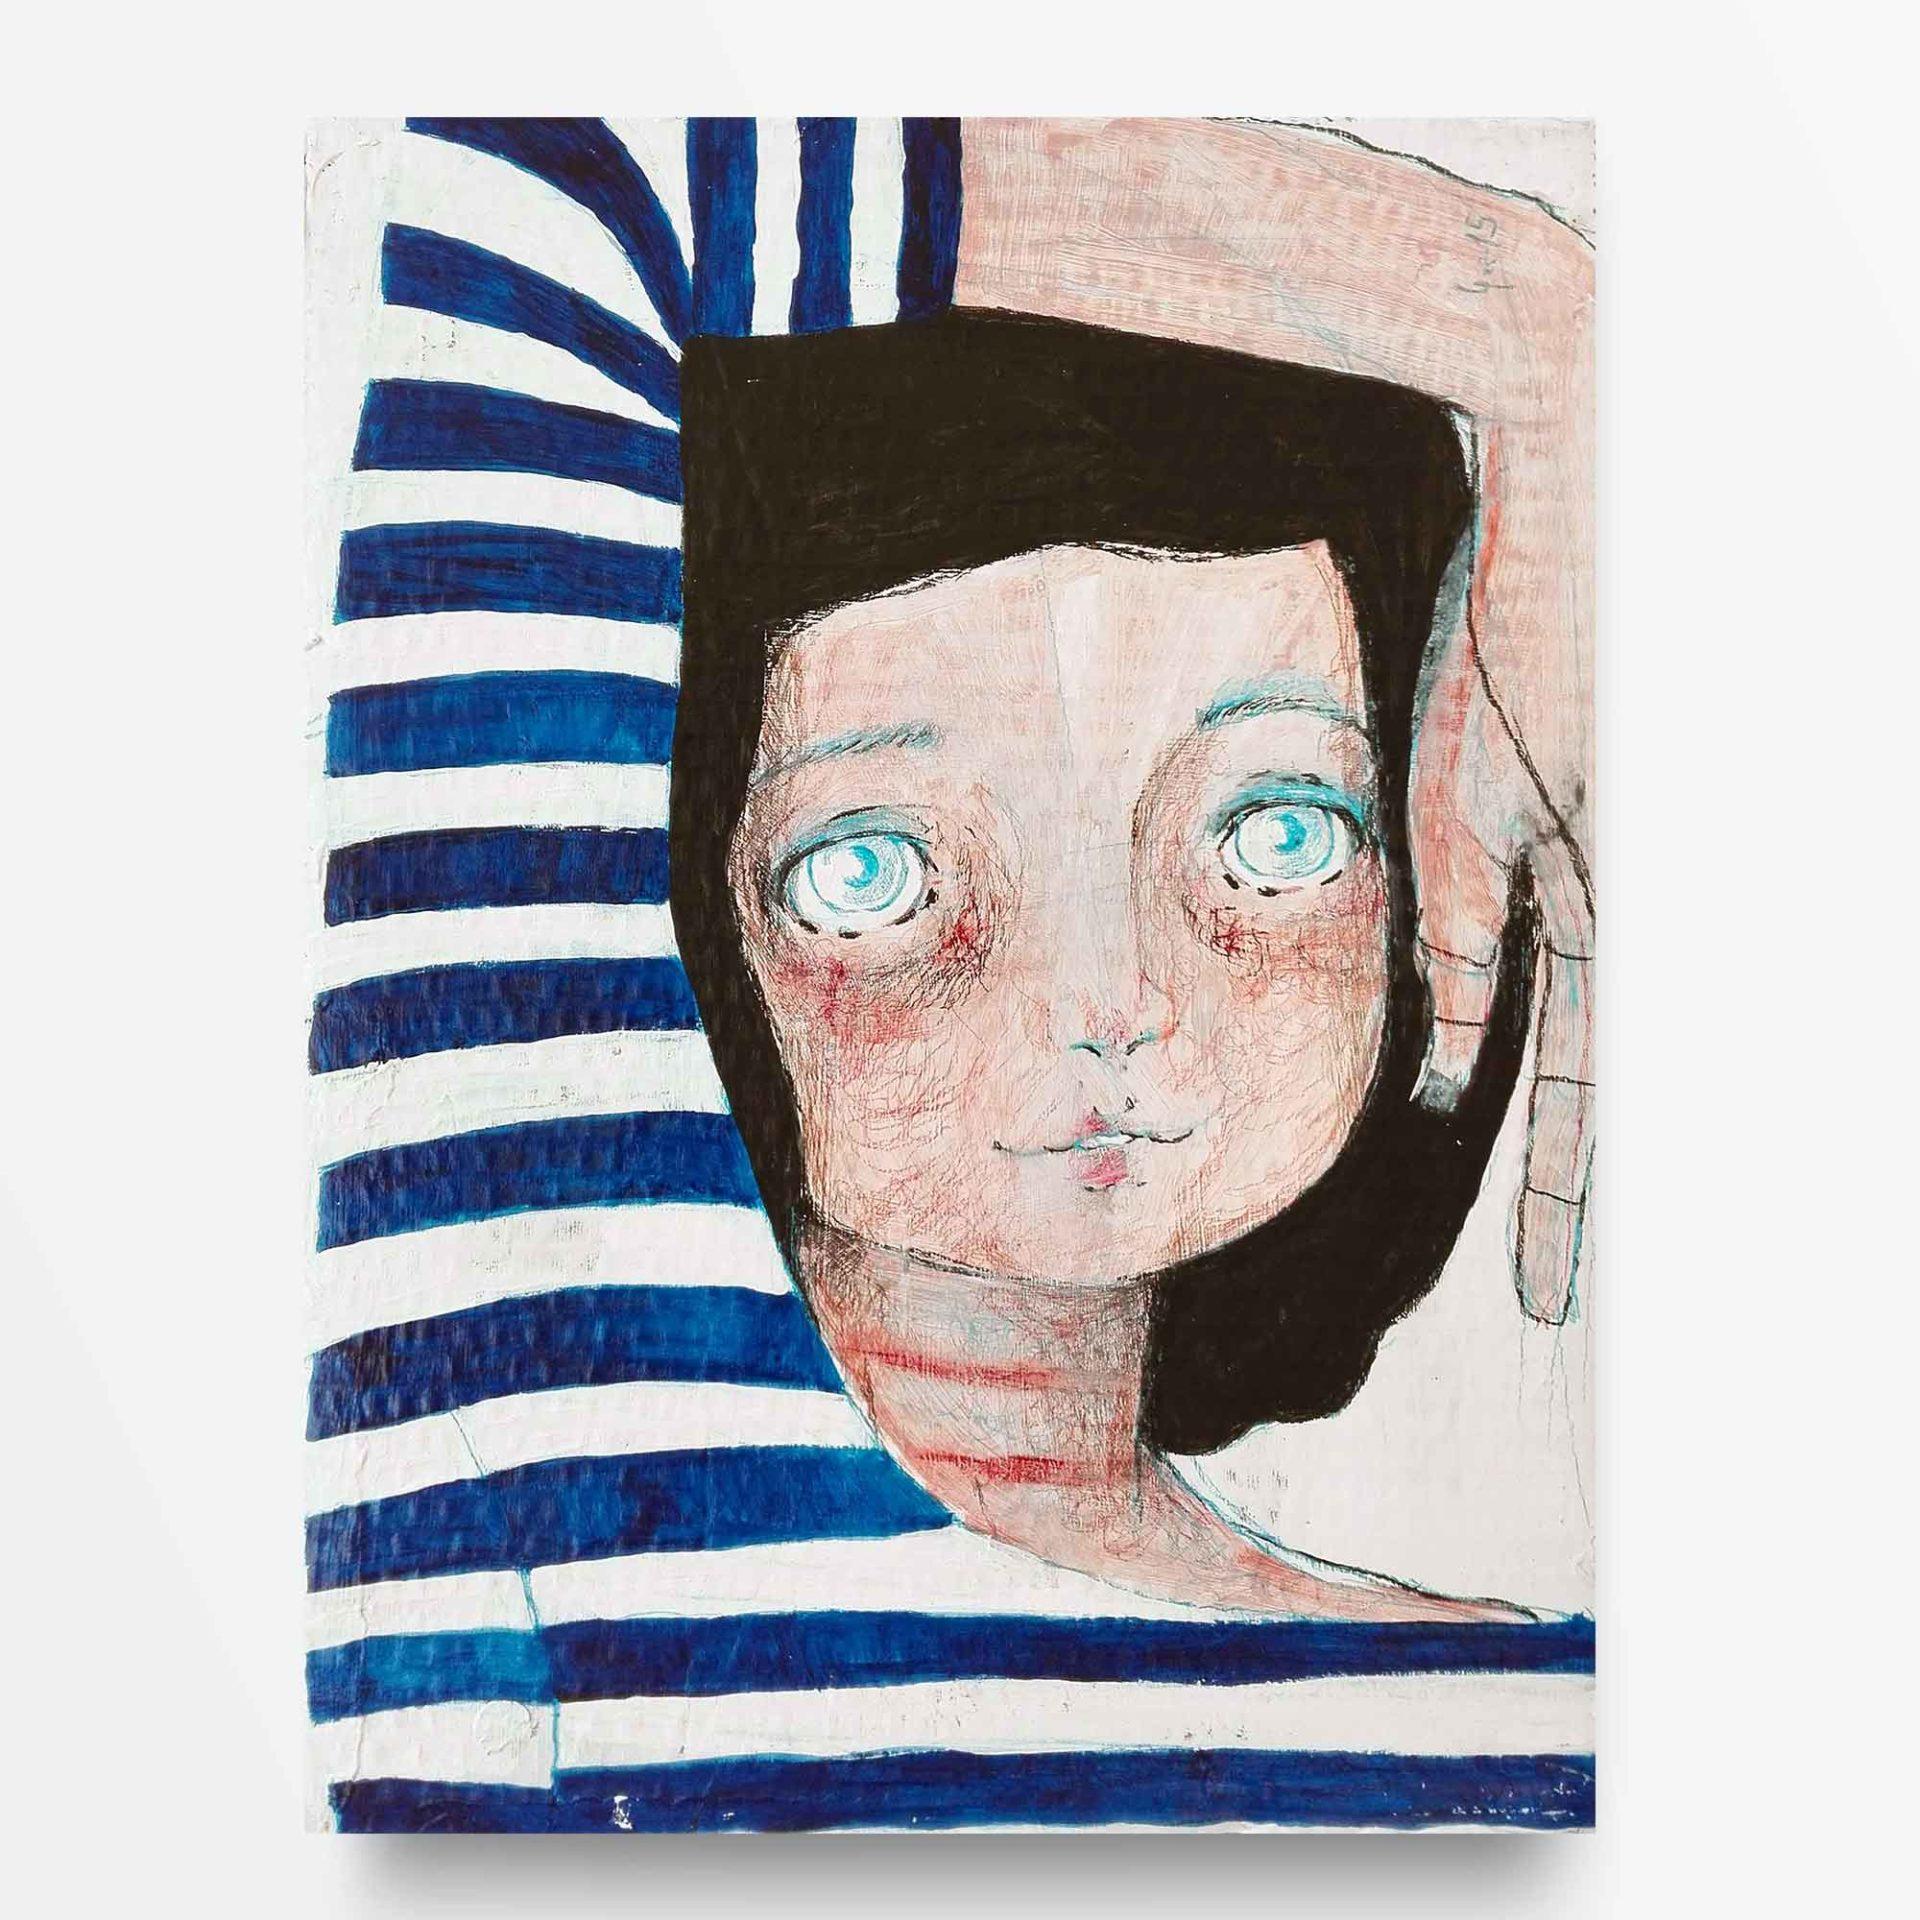 2015 Burnout Ragazza a Righe Pittura Contemporenea Diego Gabriele